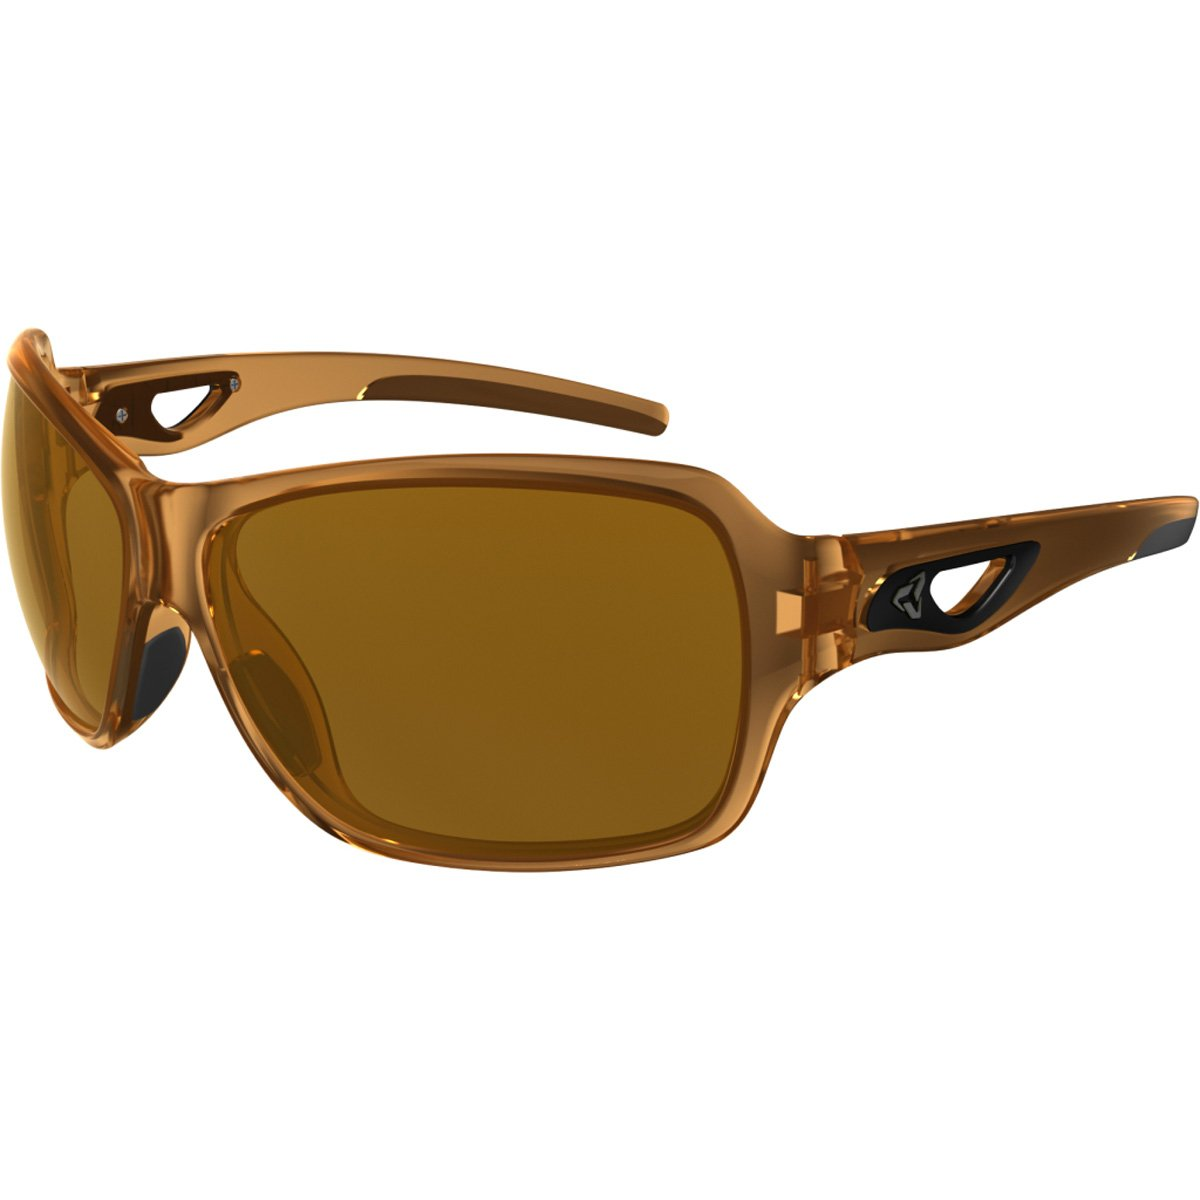 Ryders Eyewear Carlita Antifogサングラス  BROWN XTAL / BROWN LENS ANTI-FOG B06WLR6J67